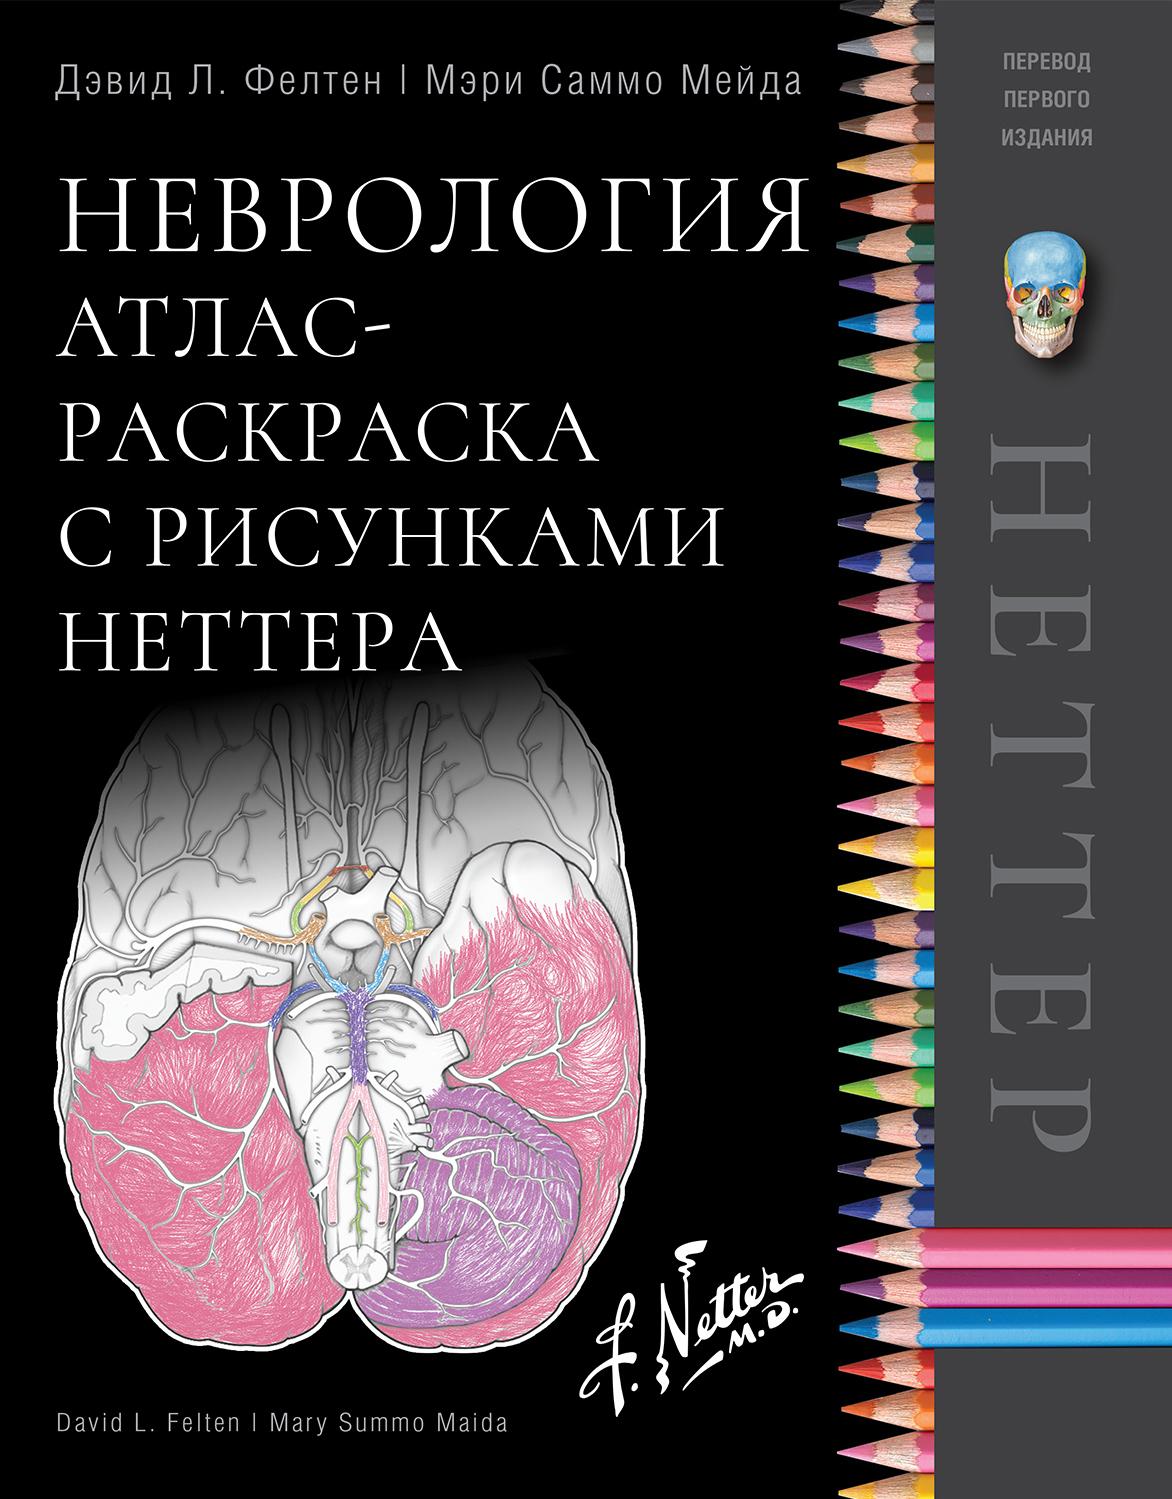 Каталог Неврология. Атлас-раскраска с рисунками Неттера neurol_atl_raskr.jpg